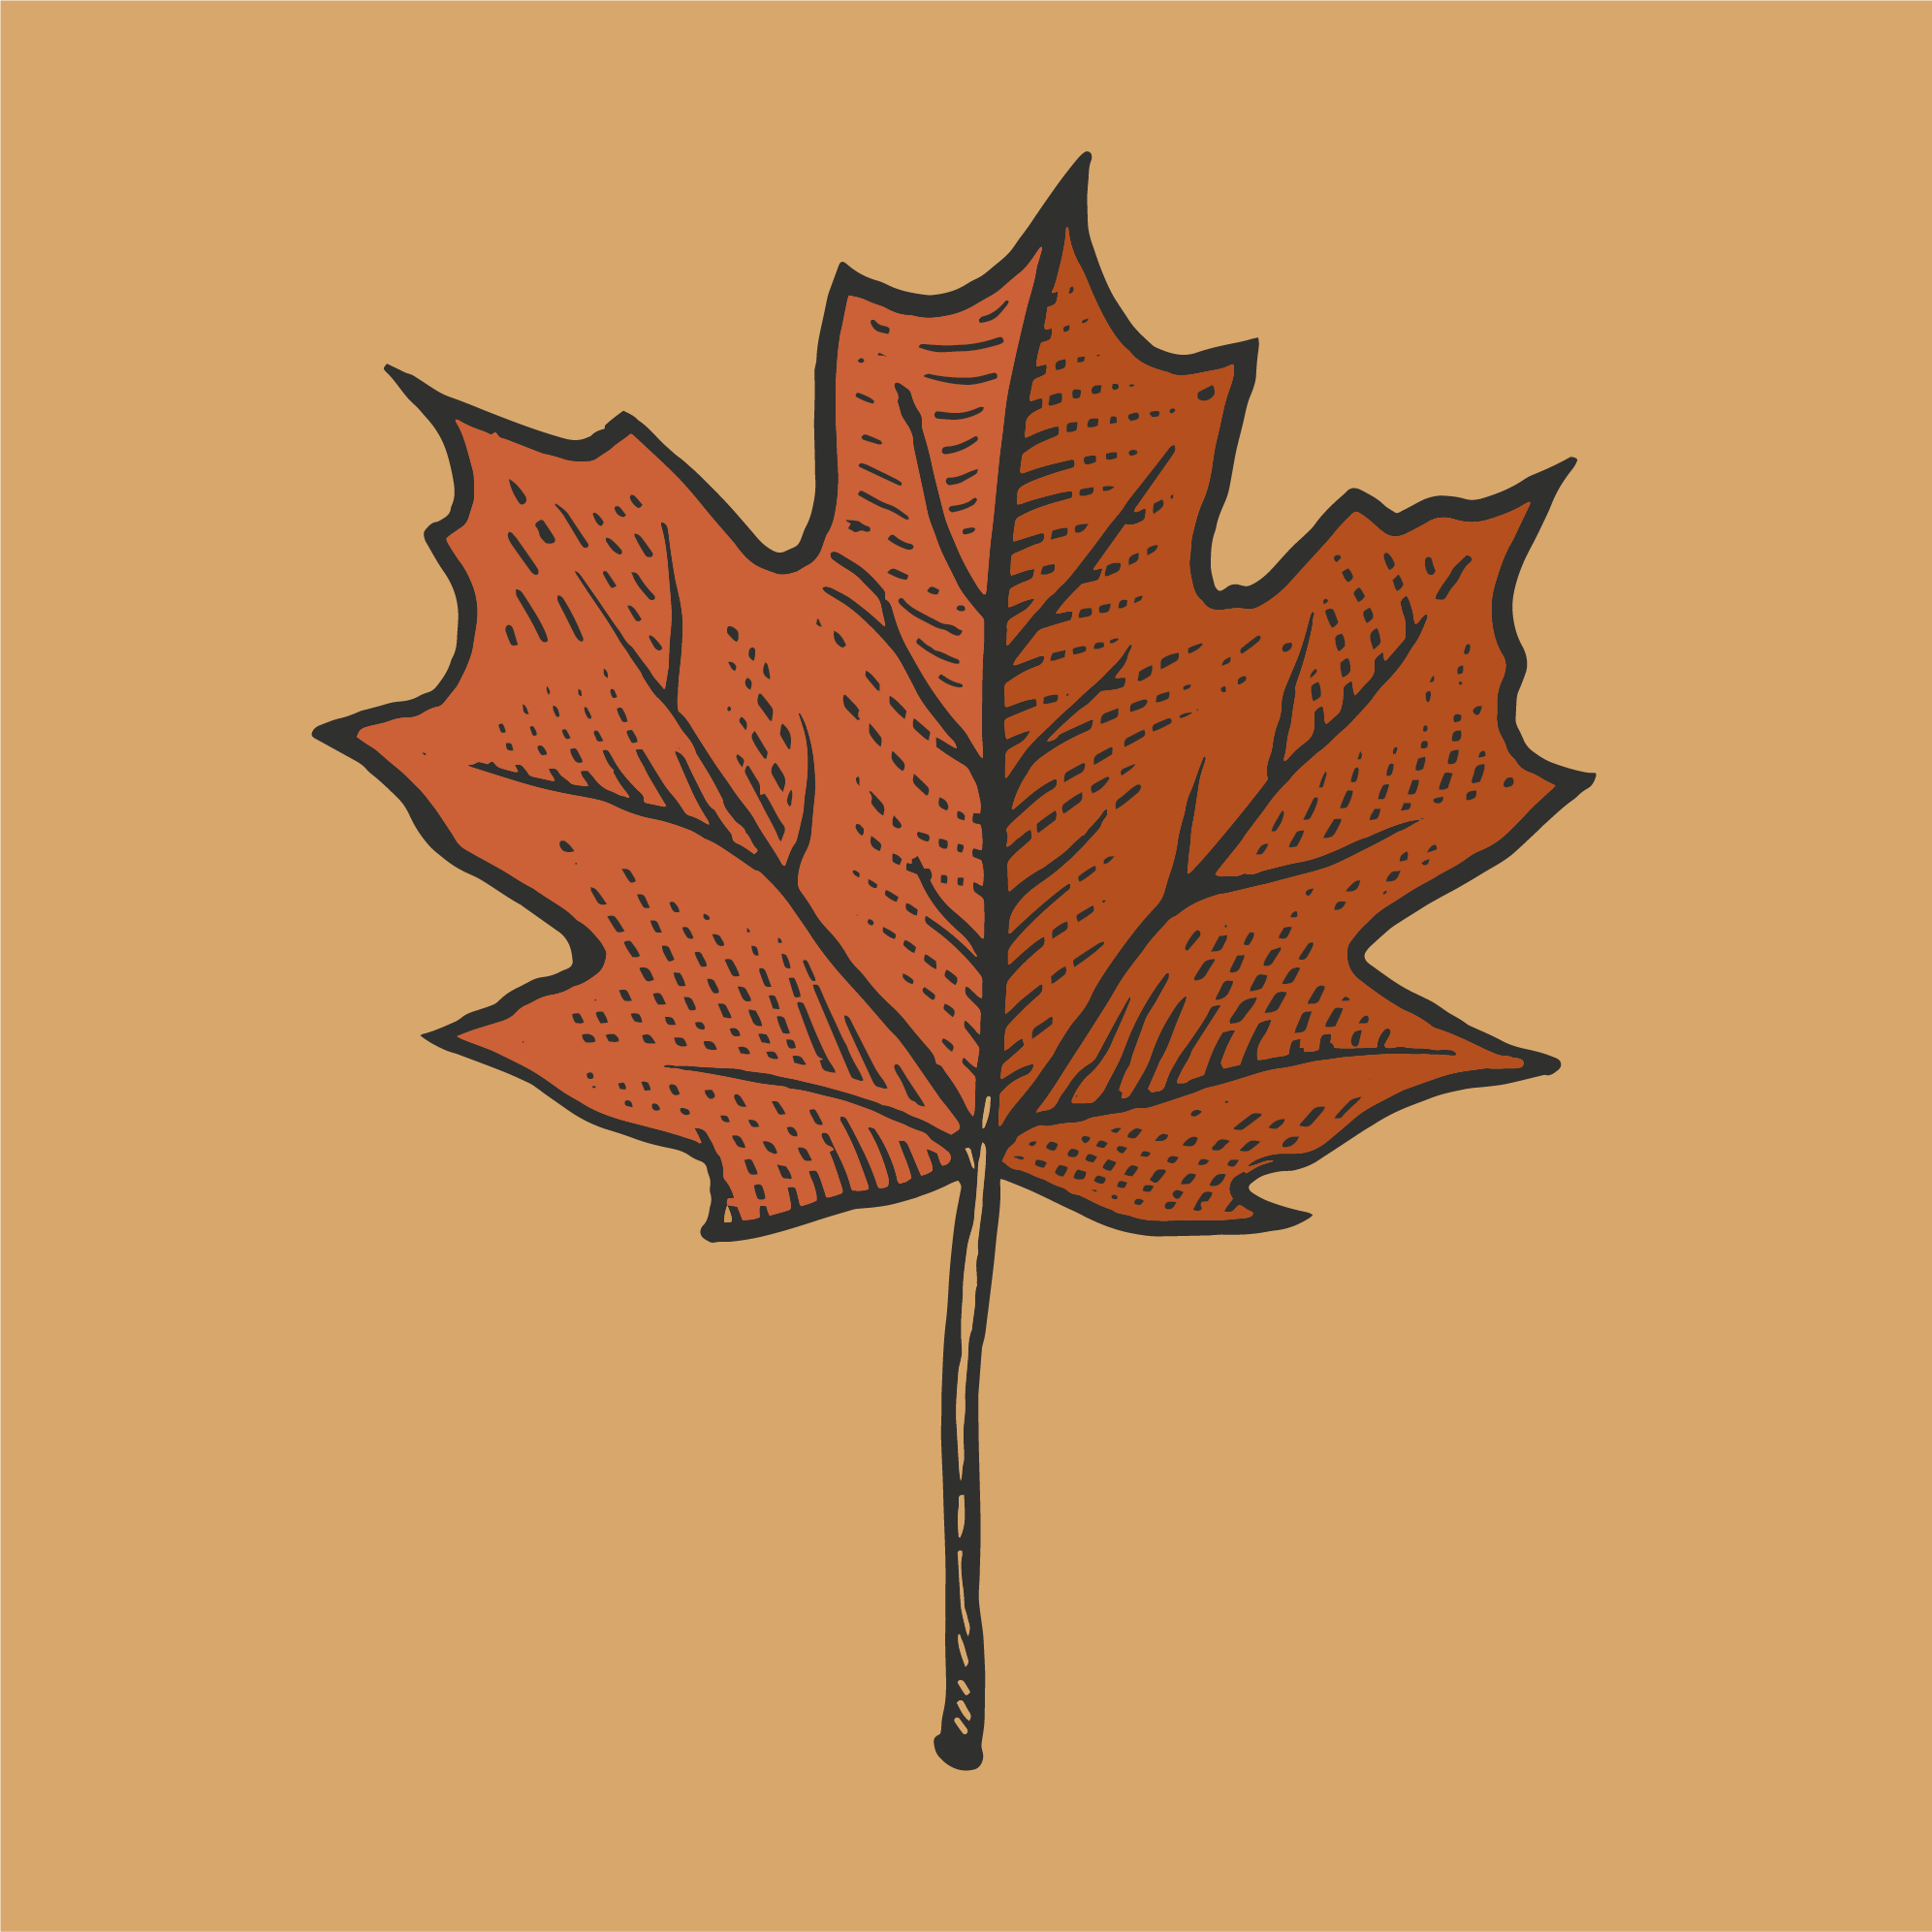 maple leaf 1.png